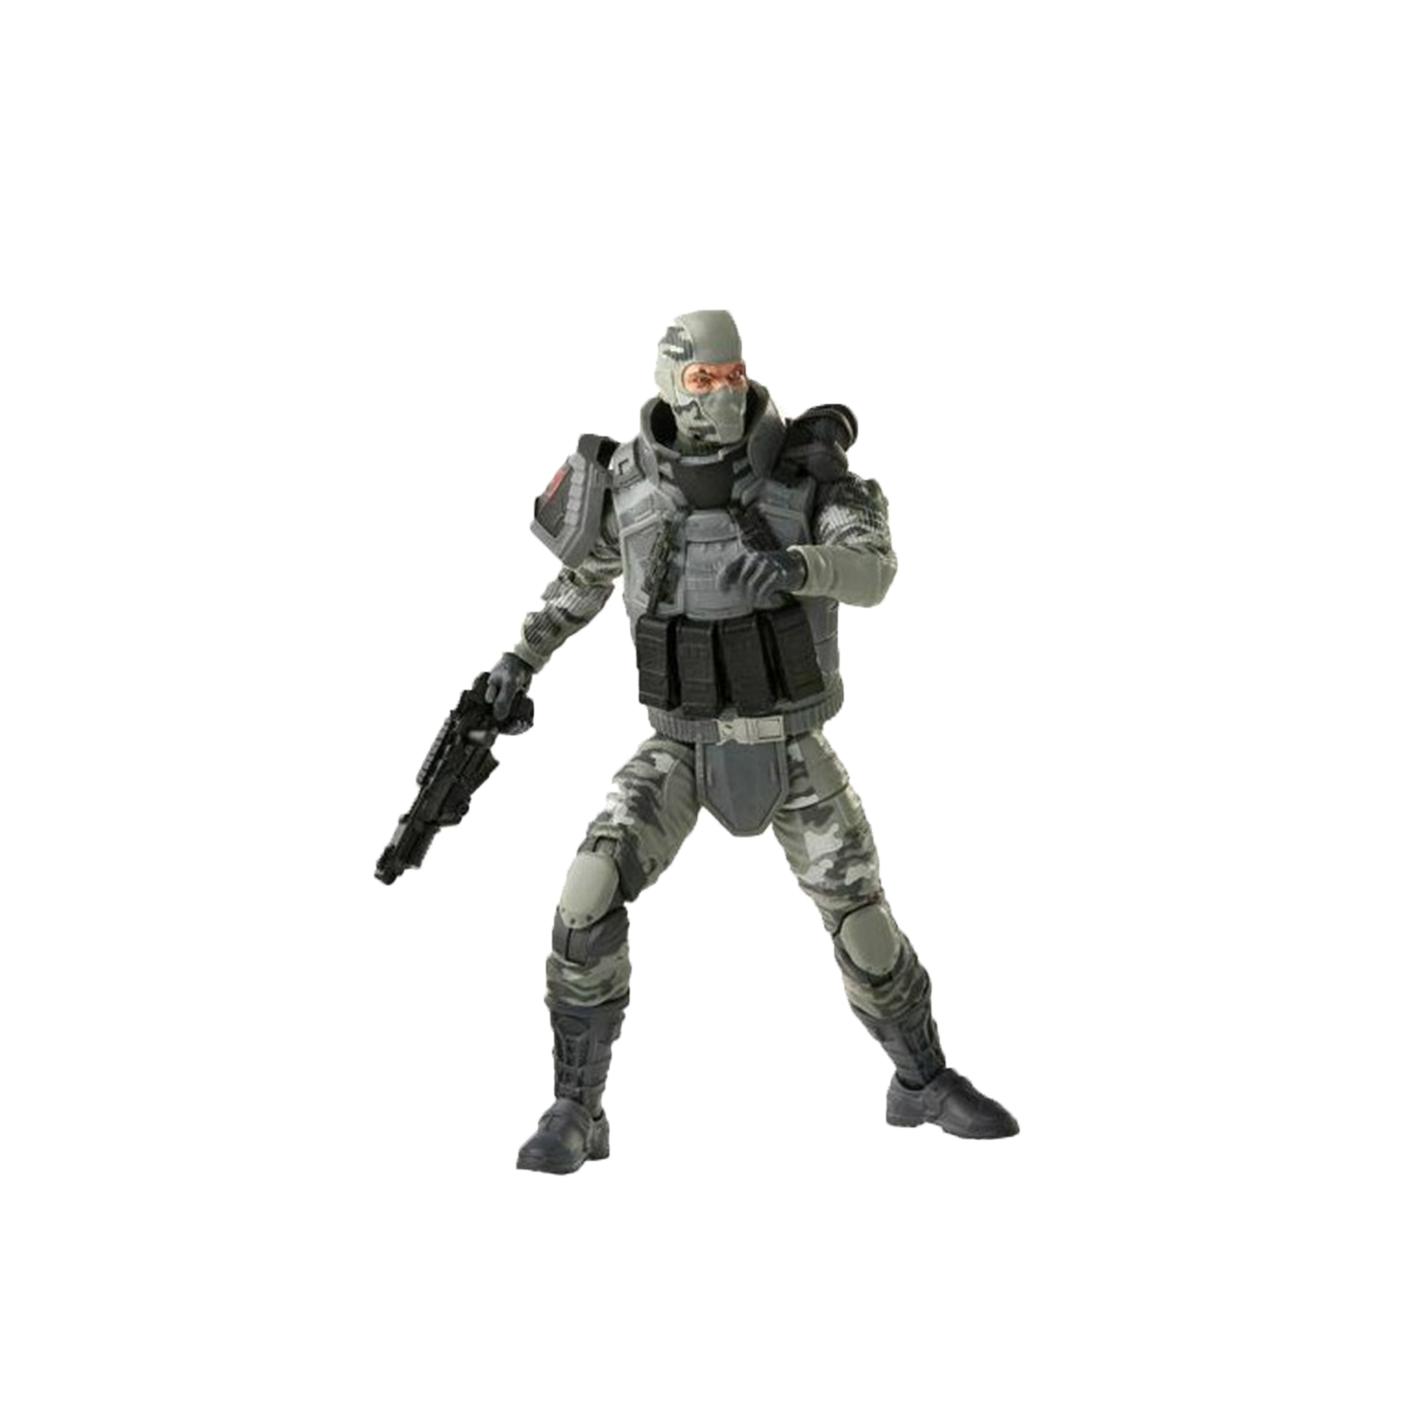 G.I. Joe Classified Series: FIREFLY (Cobra Island) by Hasbro